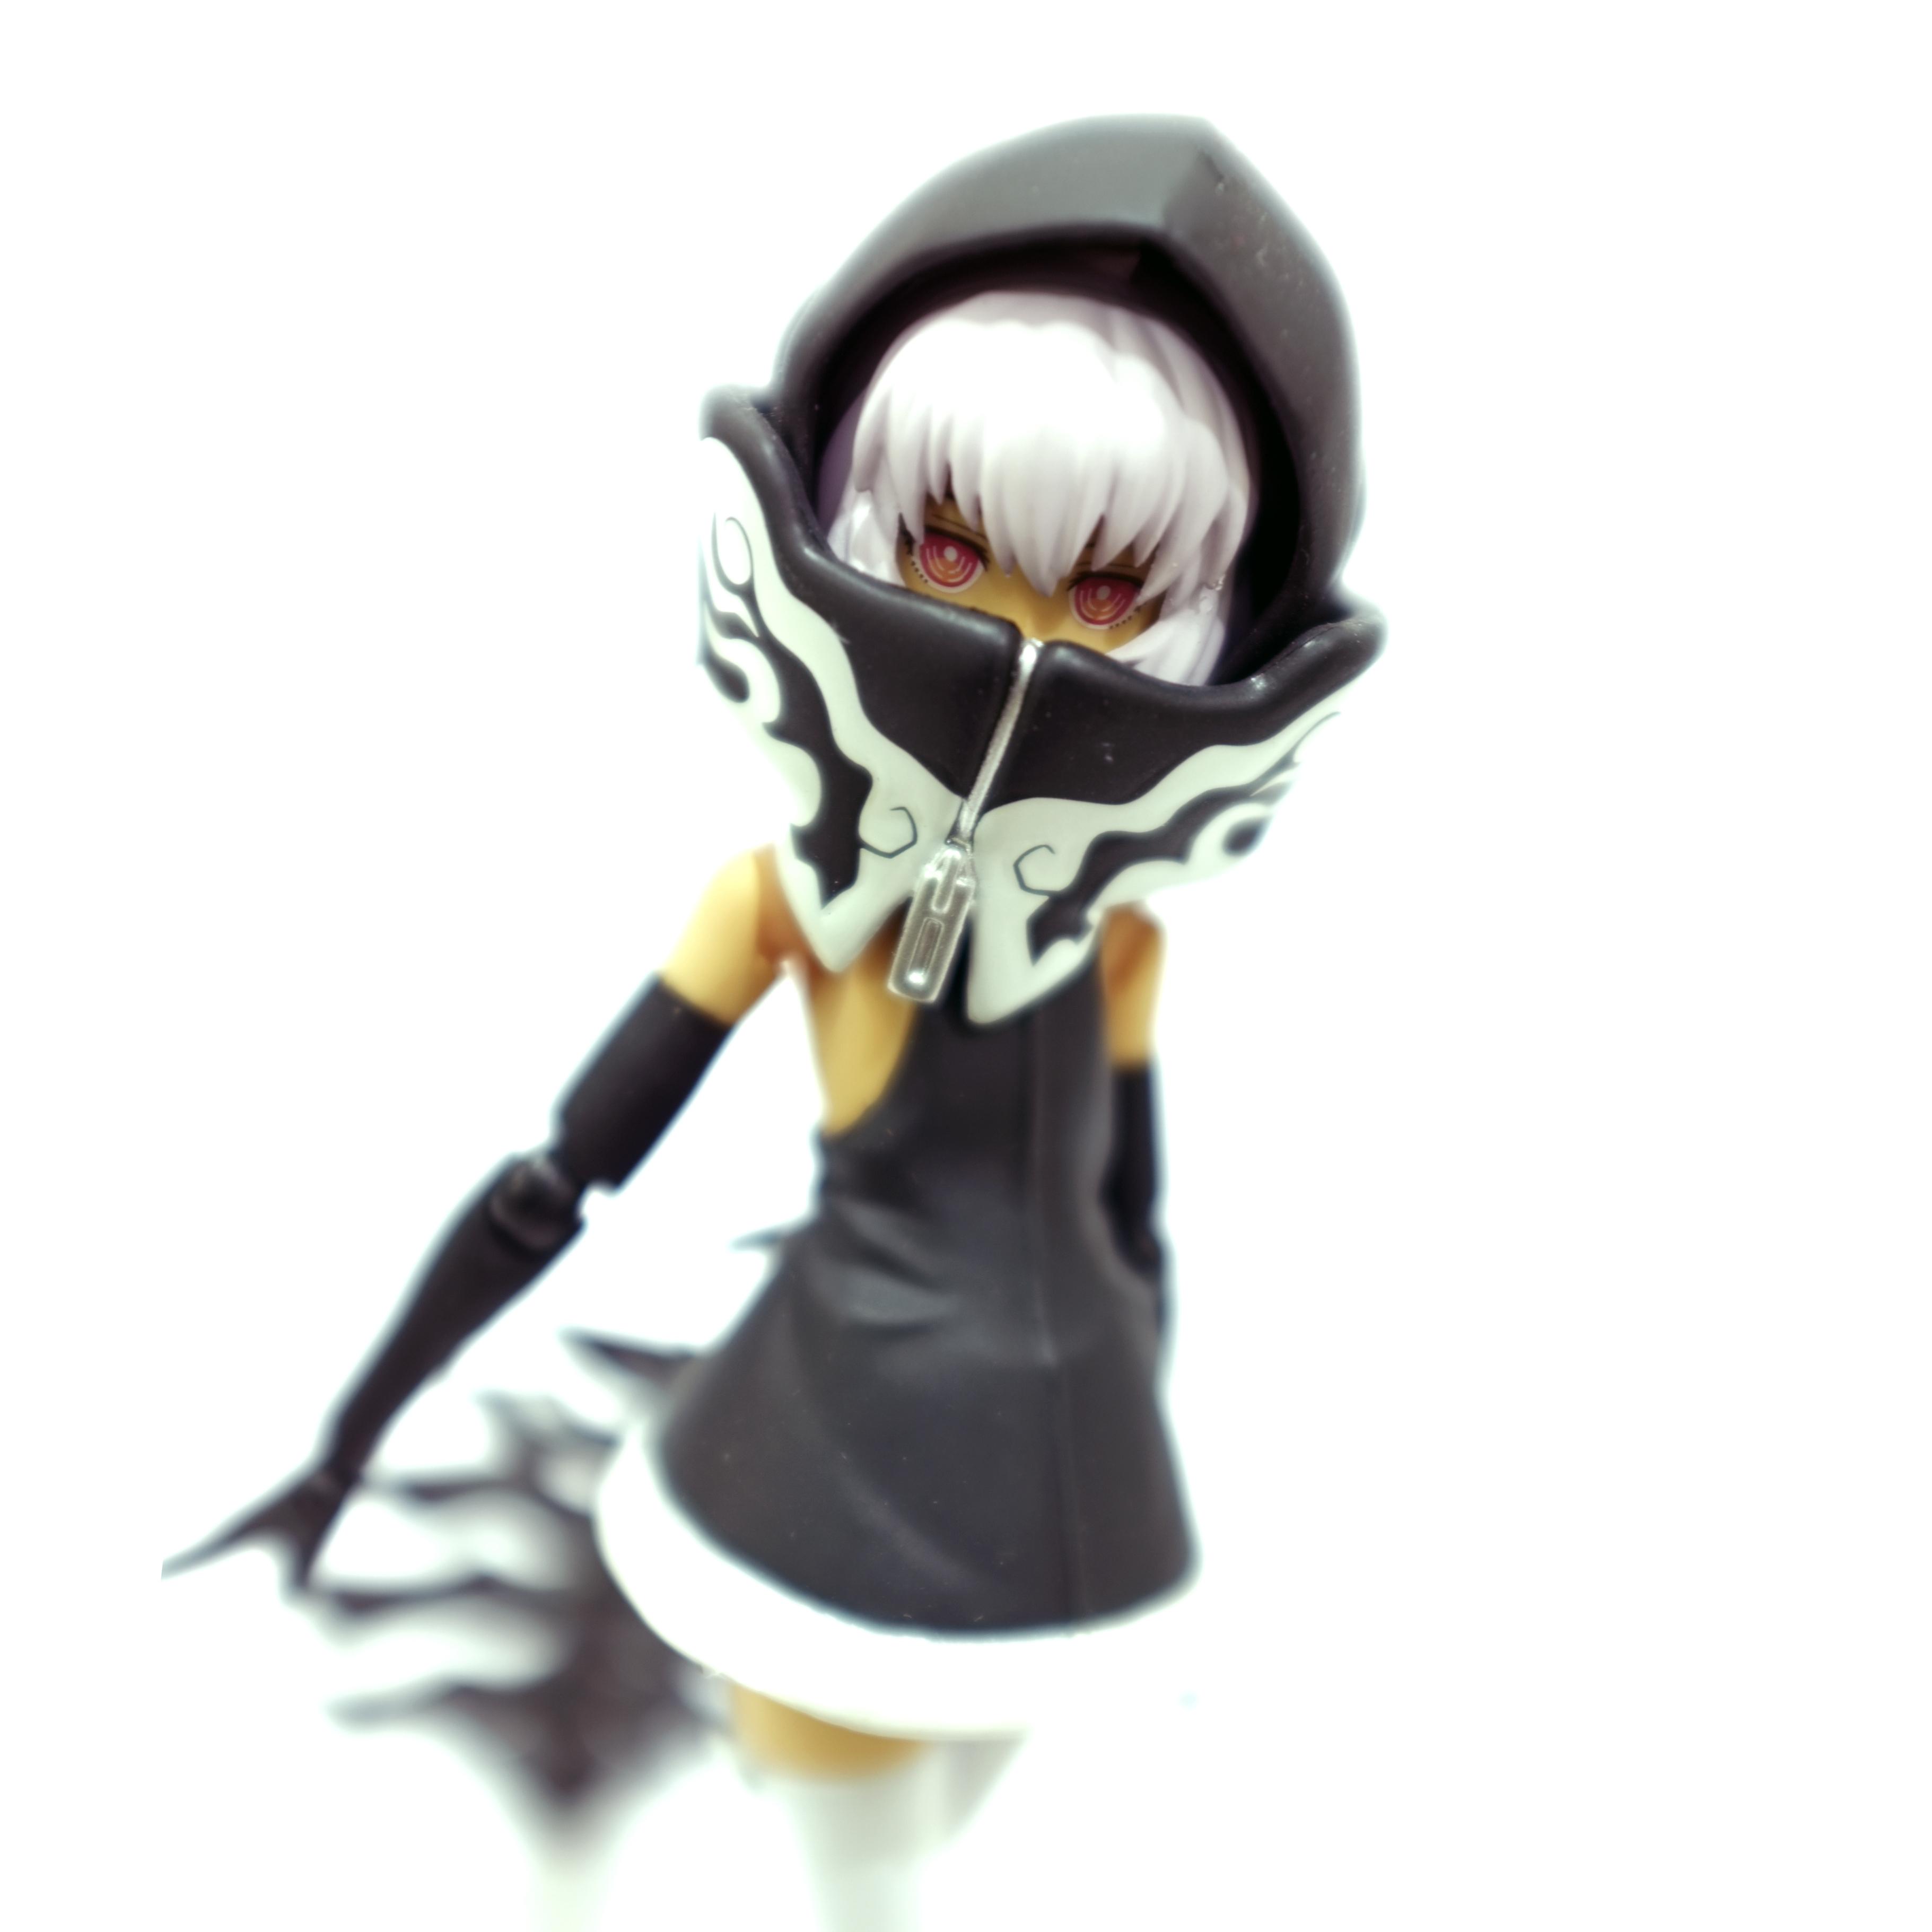 figma huke max_factory strength asai_(apsy)_masaki black_★_rock_shooter